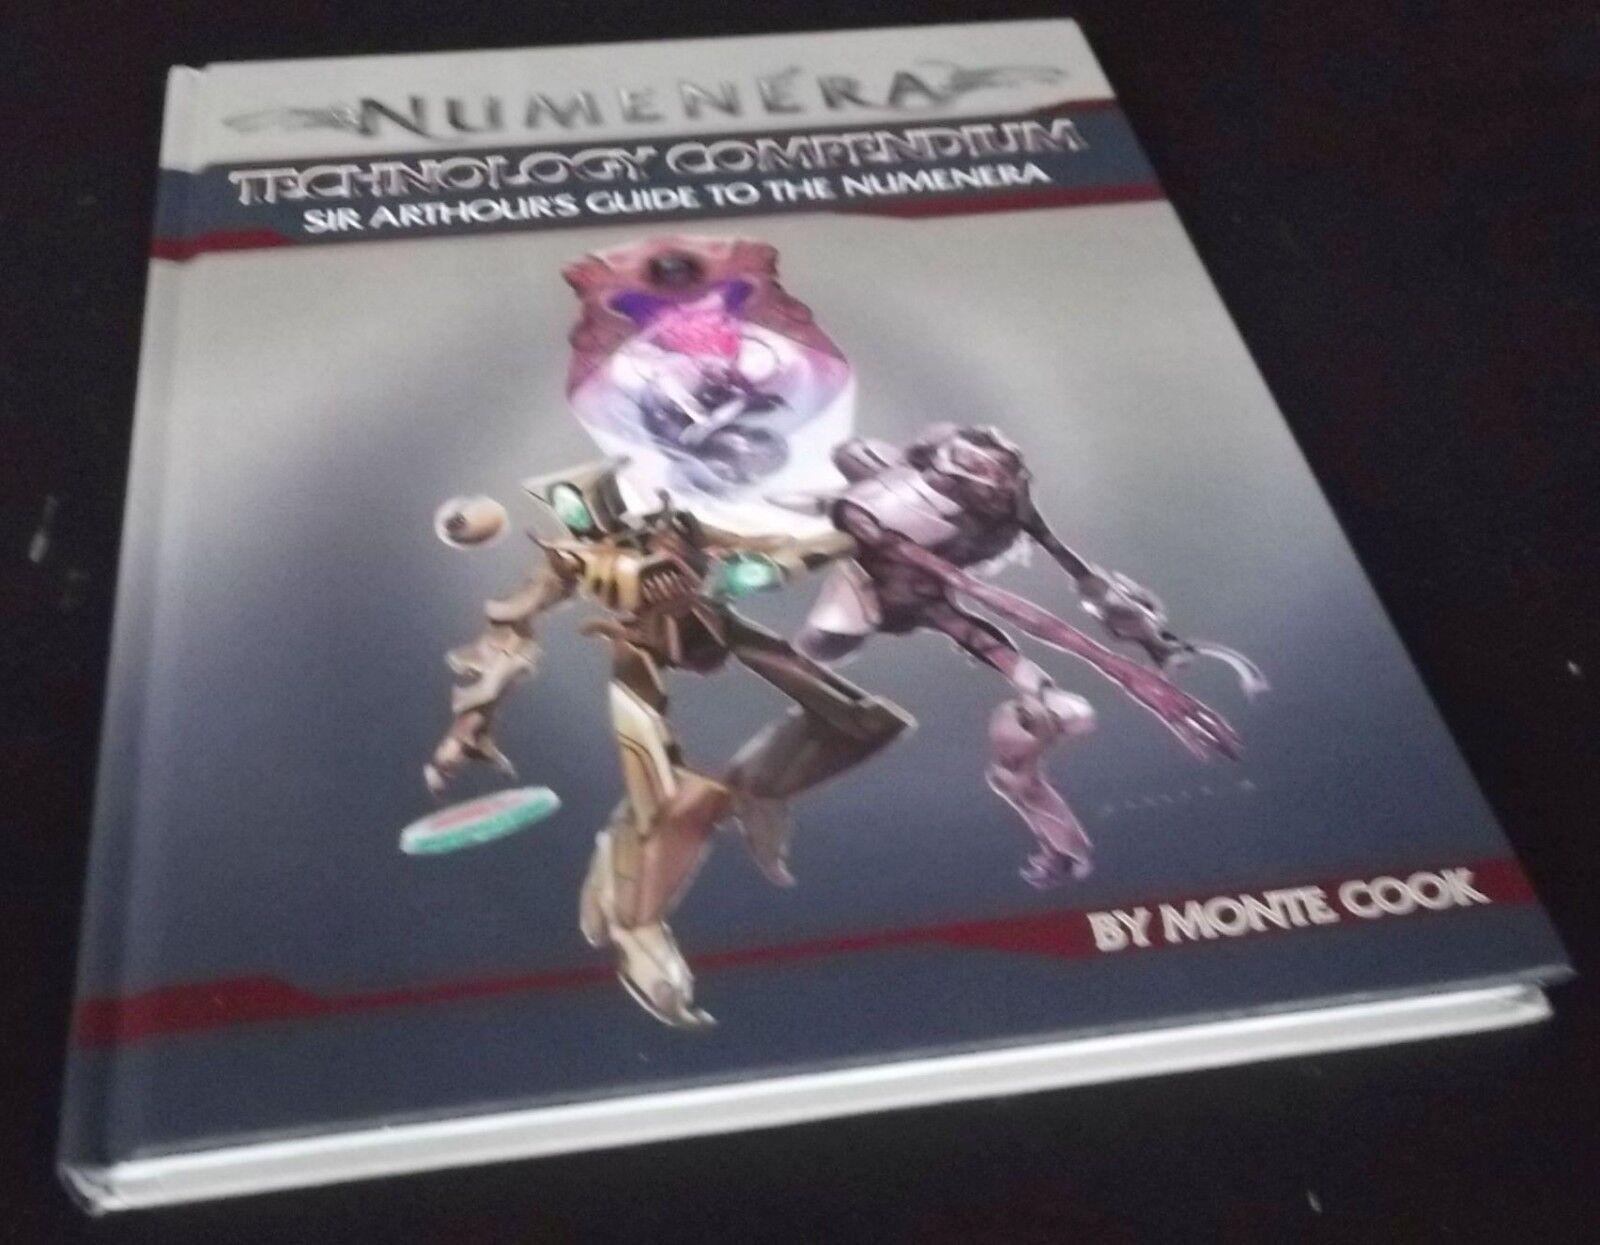 Monte Cook  Numenera Technology Compendium. 2014